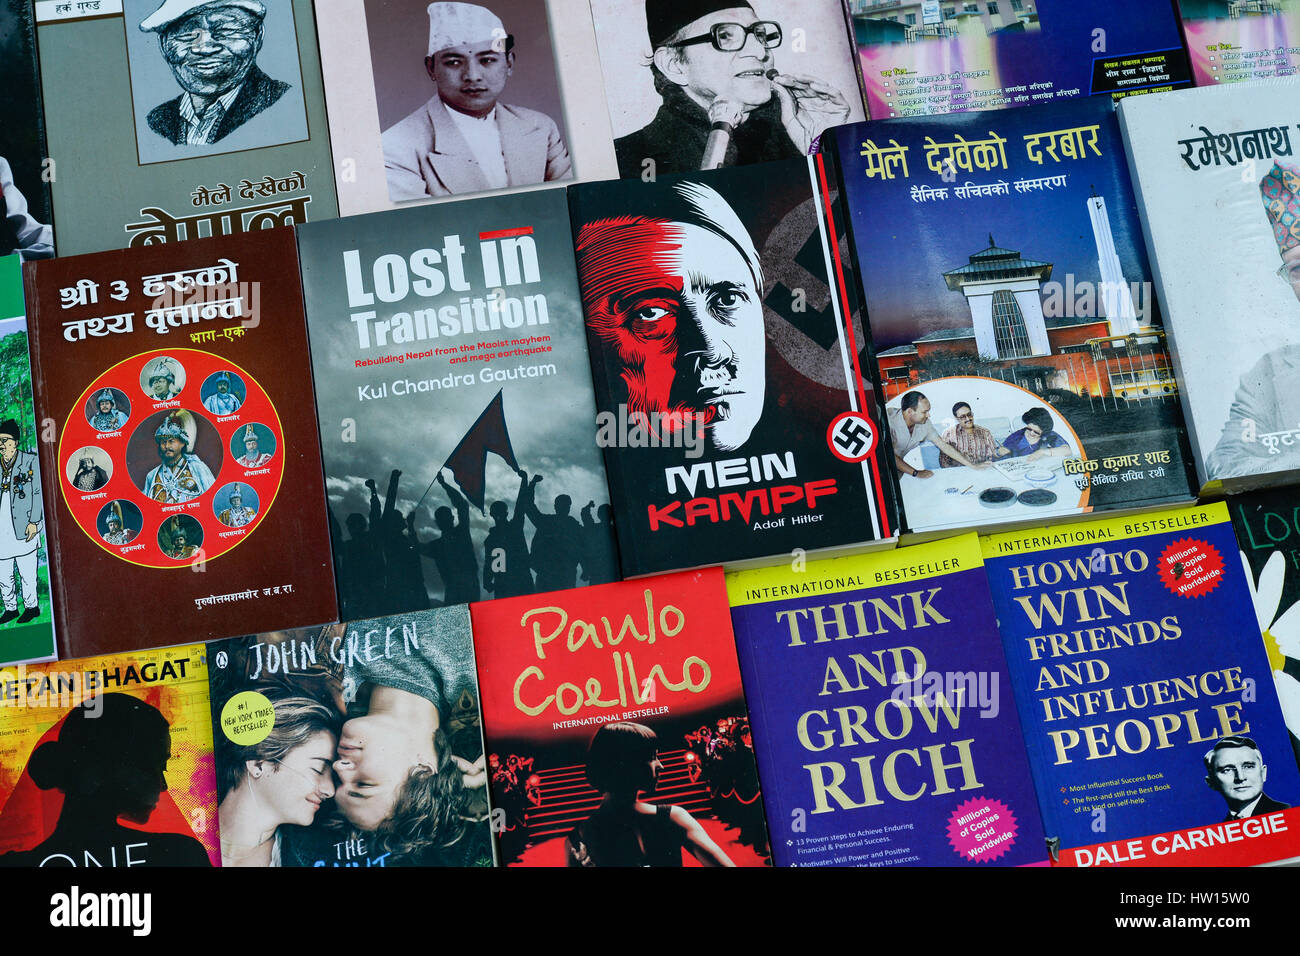 NEPAL Kathmandu, book seller on street, selling Nazi book of Adolf Hitler 'Mein Kampf' my struggle beside - Stock Image